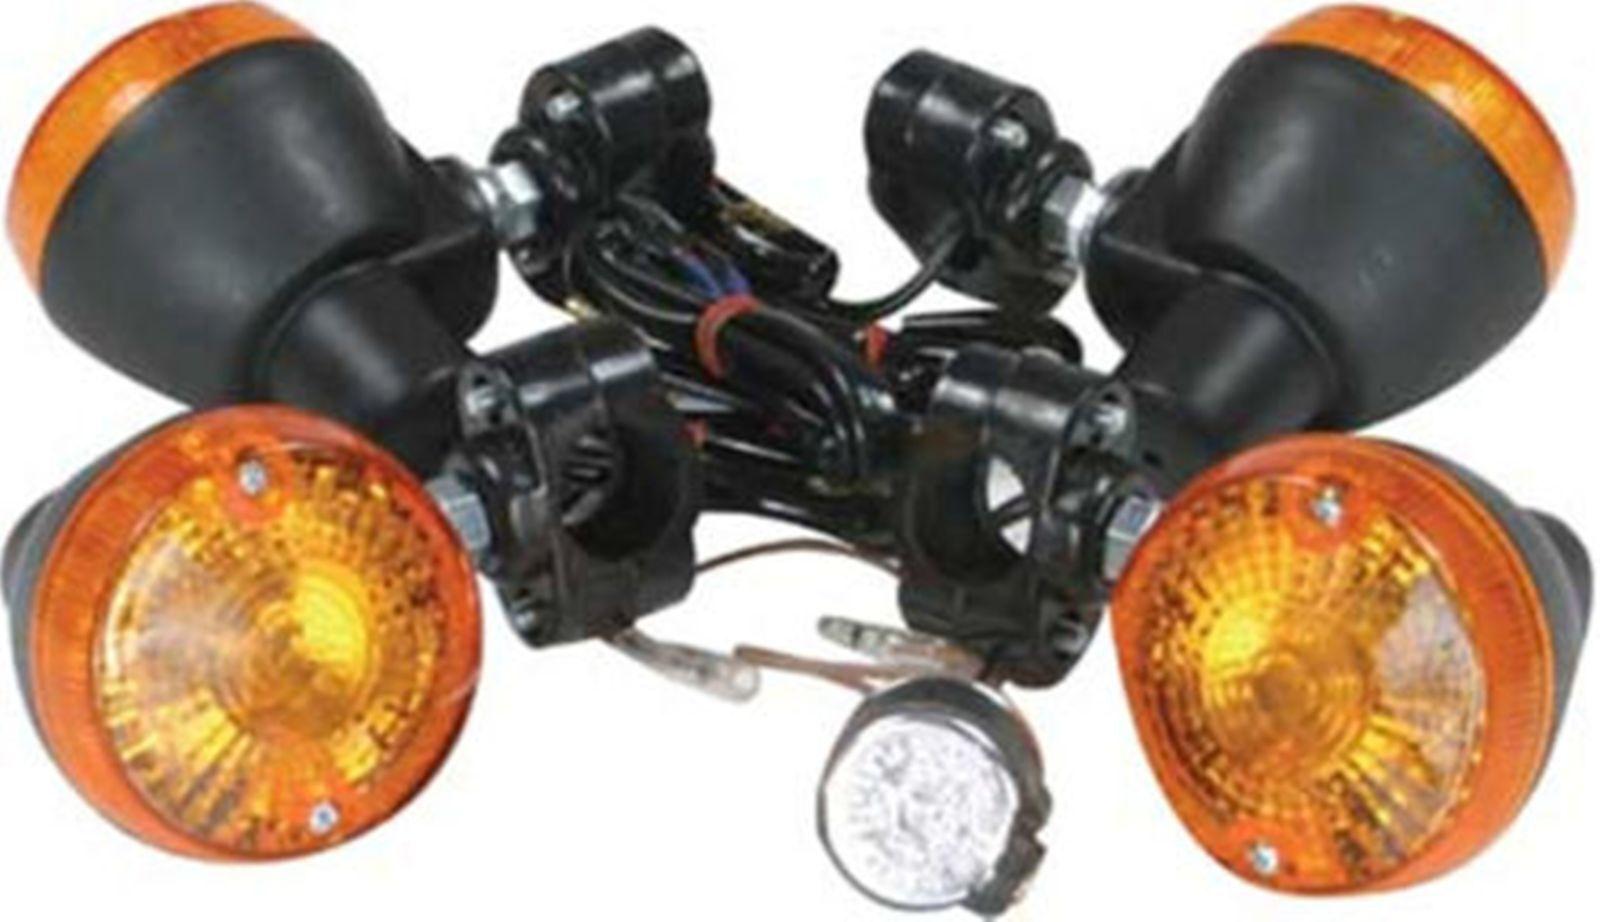 DIY TURN SIGNAL KIT w/ Switch Fits ATVs UTVs Golf Cart Go-Kart Universal Fit